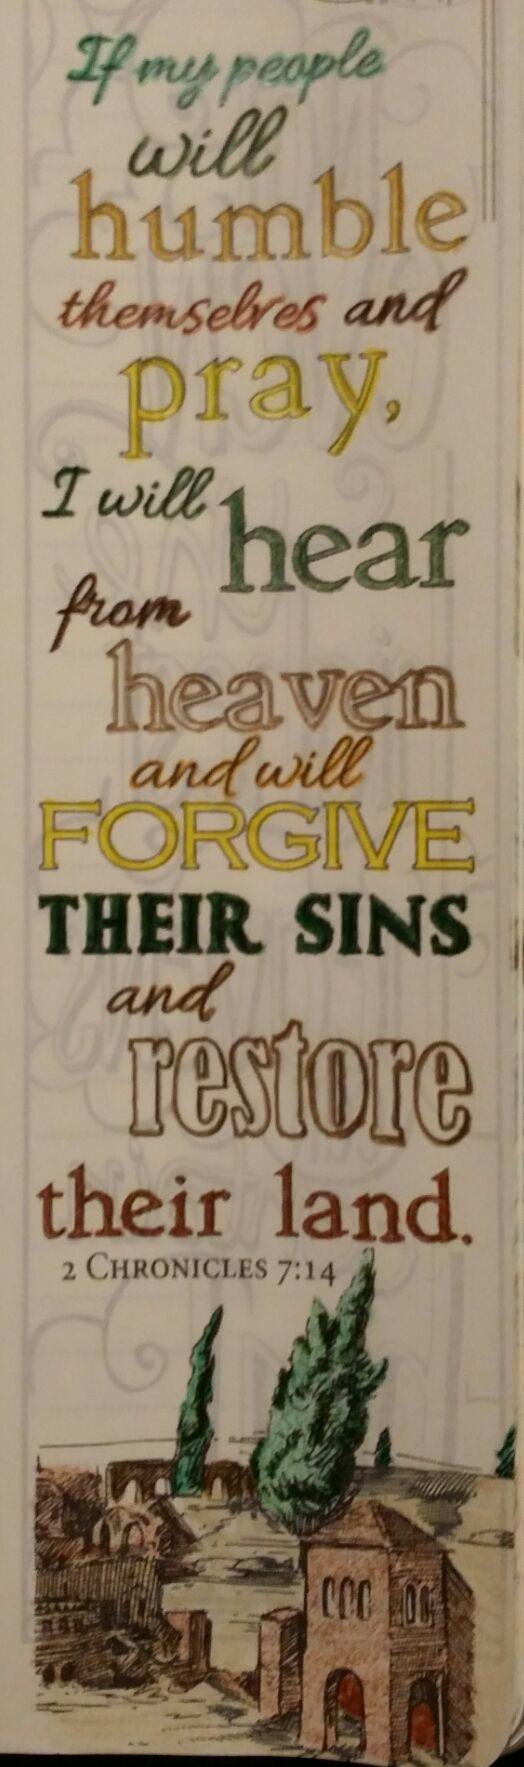 2 Chronicles 7:14 #theinspirebible https://www.youtube.com/watch?v=YdYnGkzA1C8